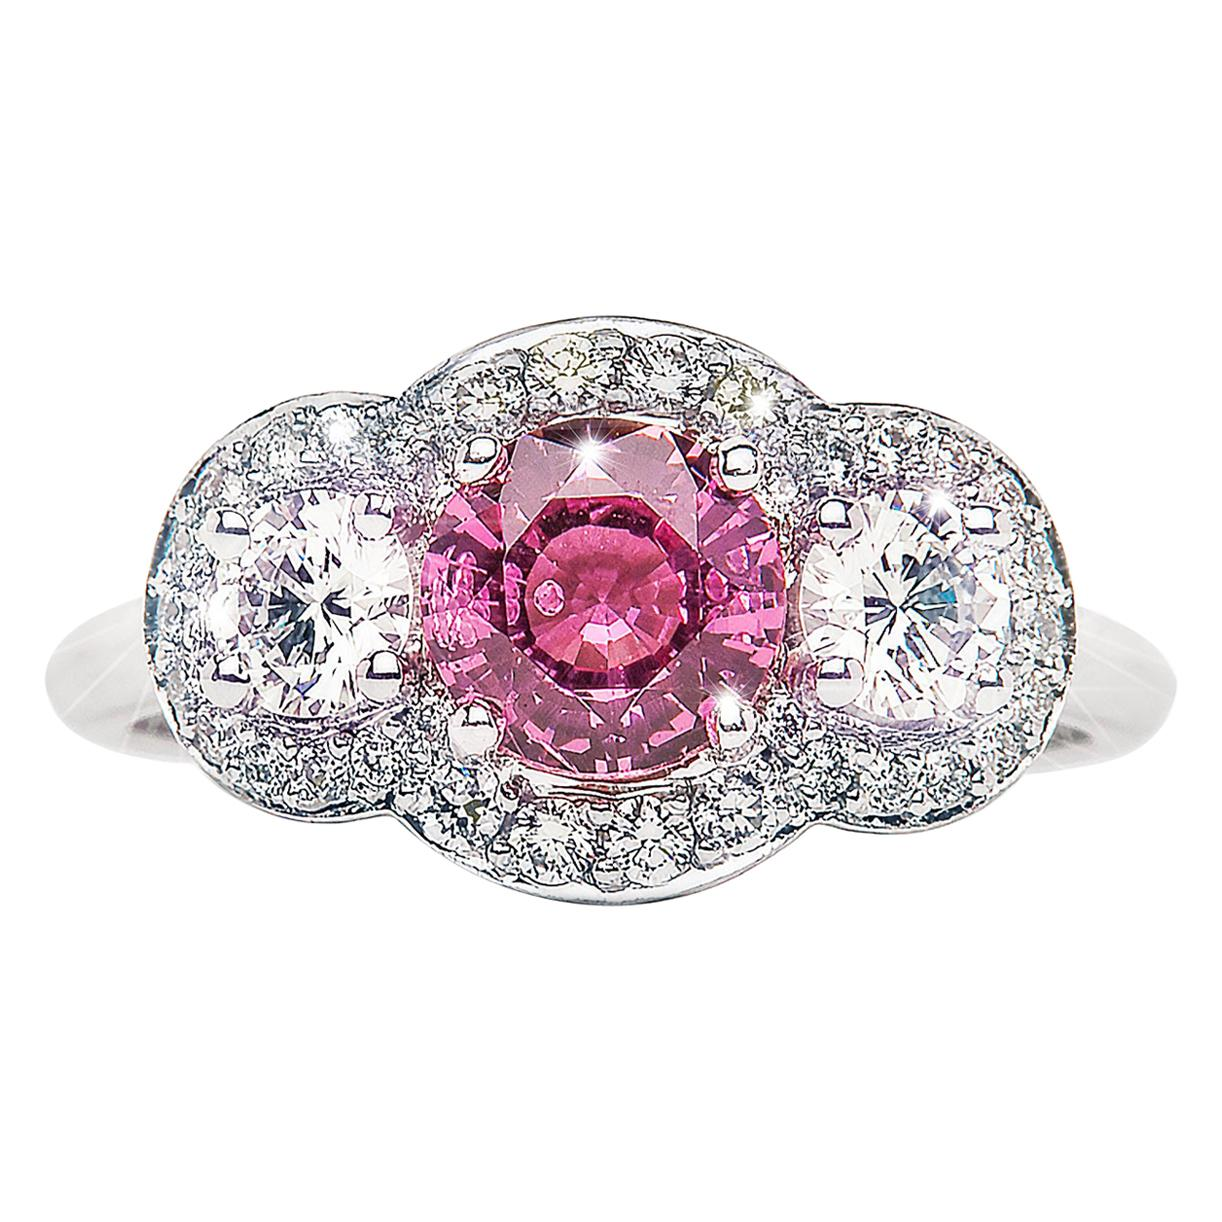 1.21 Carat Pink Tourmaline Round Diamond 3-Stone Cluster Ring Natalie Barney